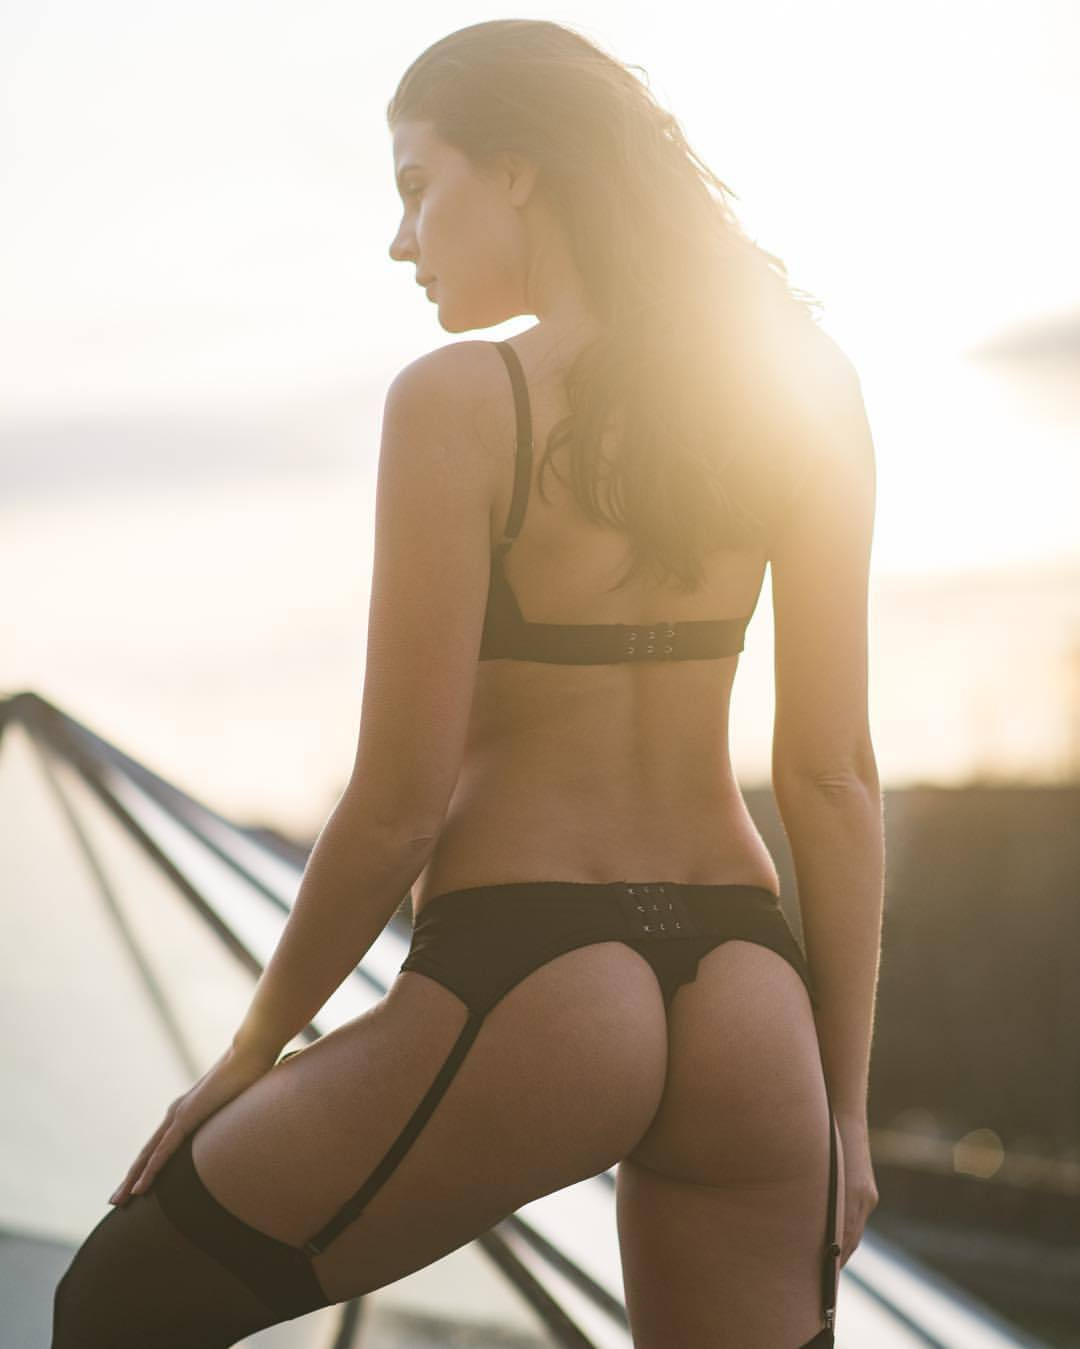 be yourself. be free. be good.   thank you @olgakaminska   #sunset #winter #lingerie #female #model #polish #brunette #berlin #studiobatterie #coldasfuck #toughcookie #beautifulwoman #sensual #🔥 #💪🏽 #😍 #📸 #💃🏻 #🍑  (at Berlin, Germany)